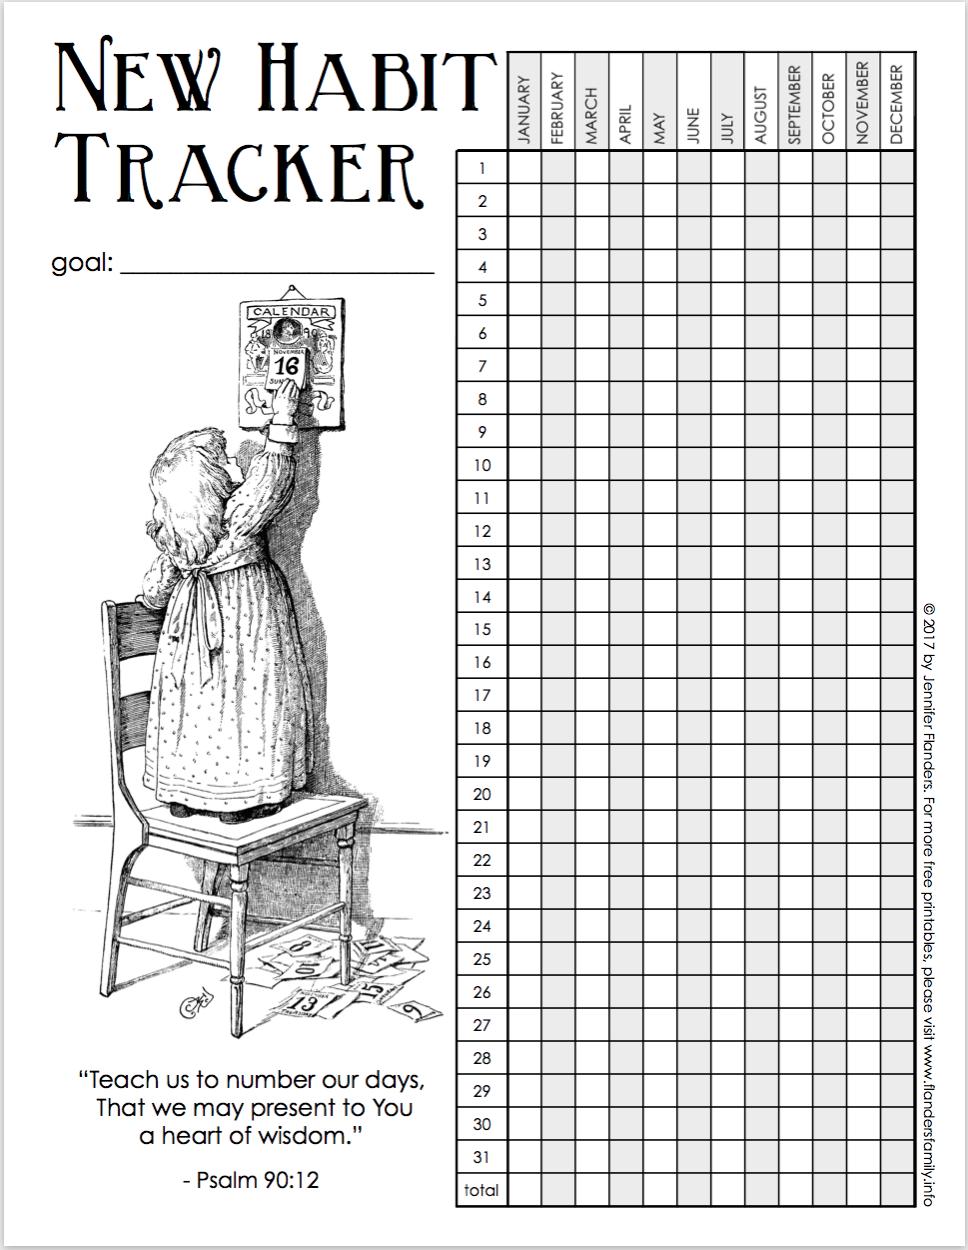 New Habit Tracking Chart - Free Printable